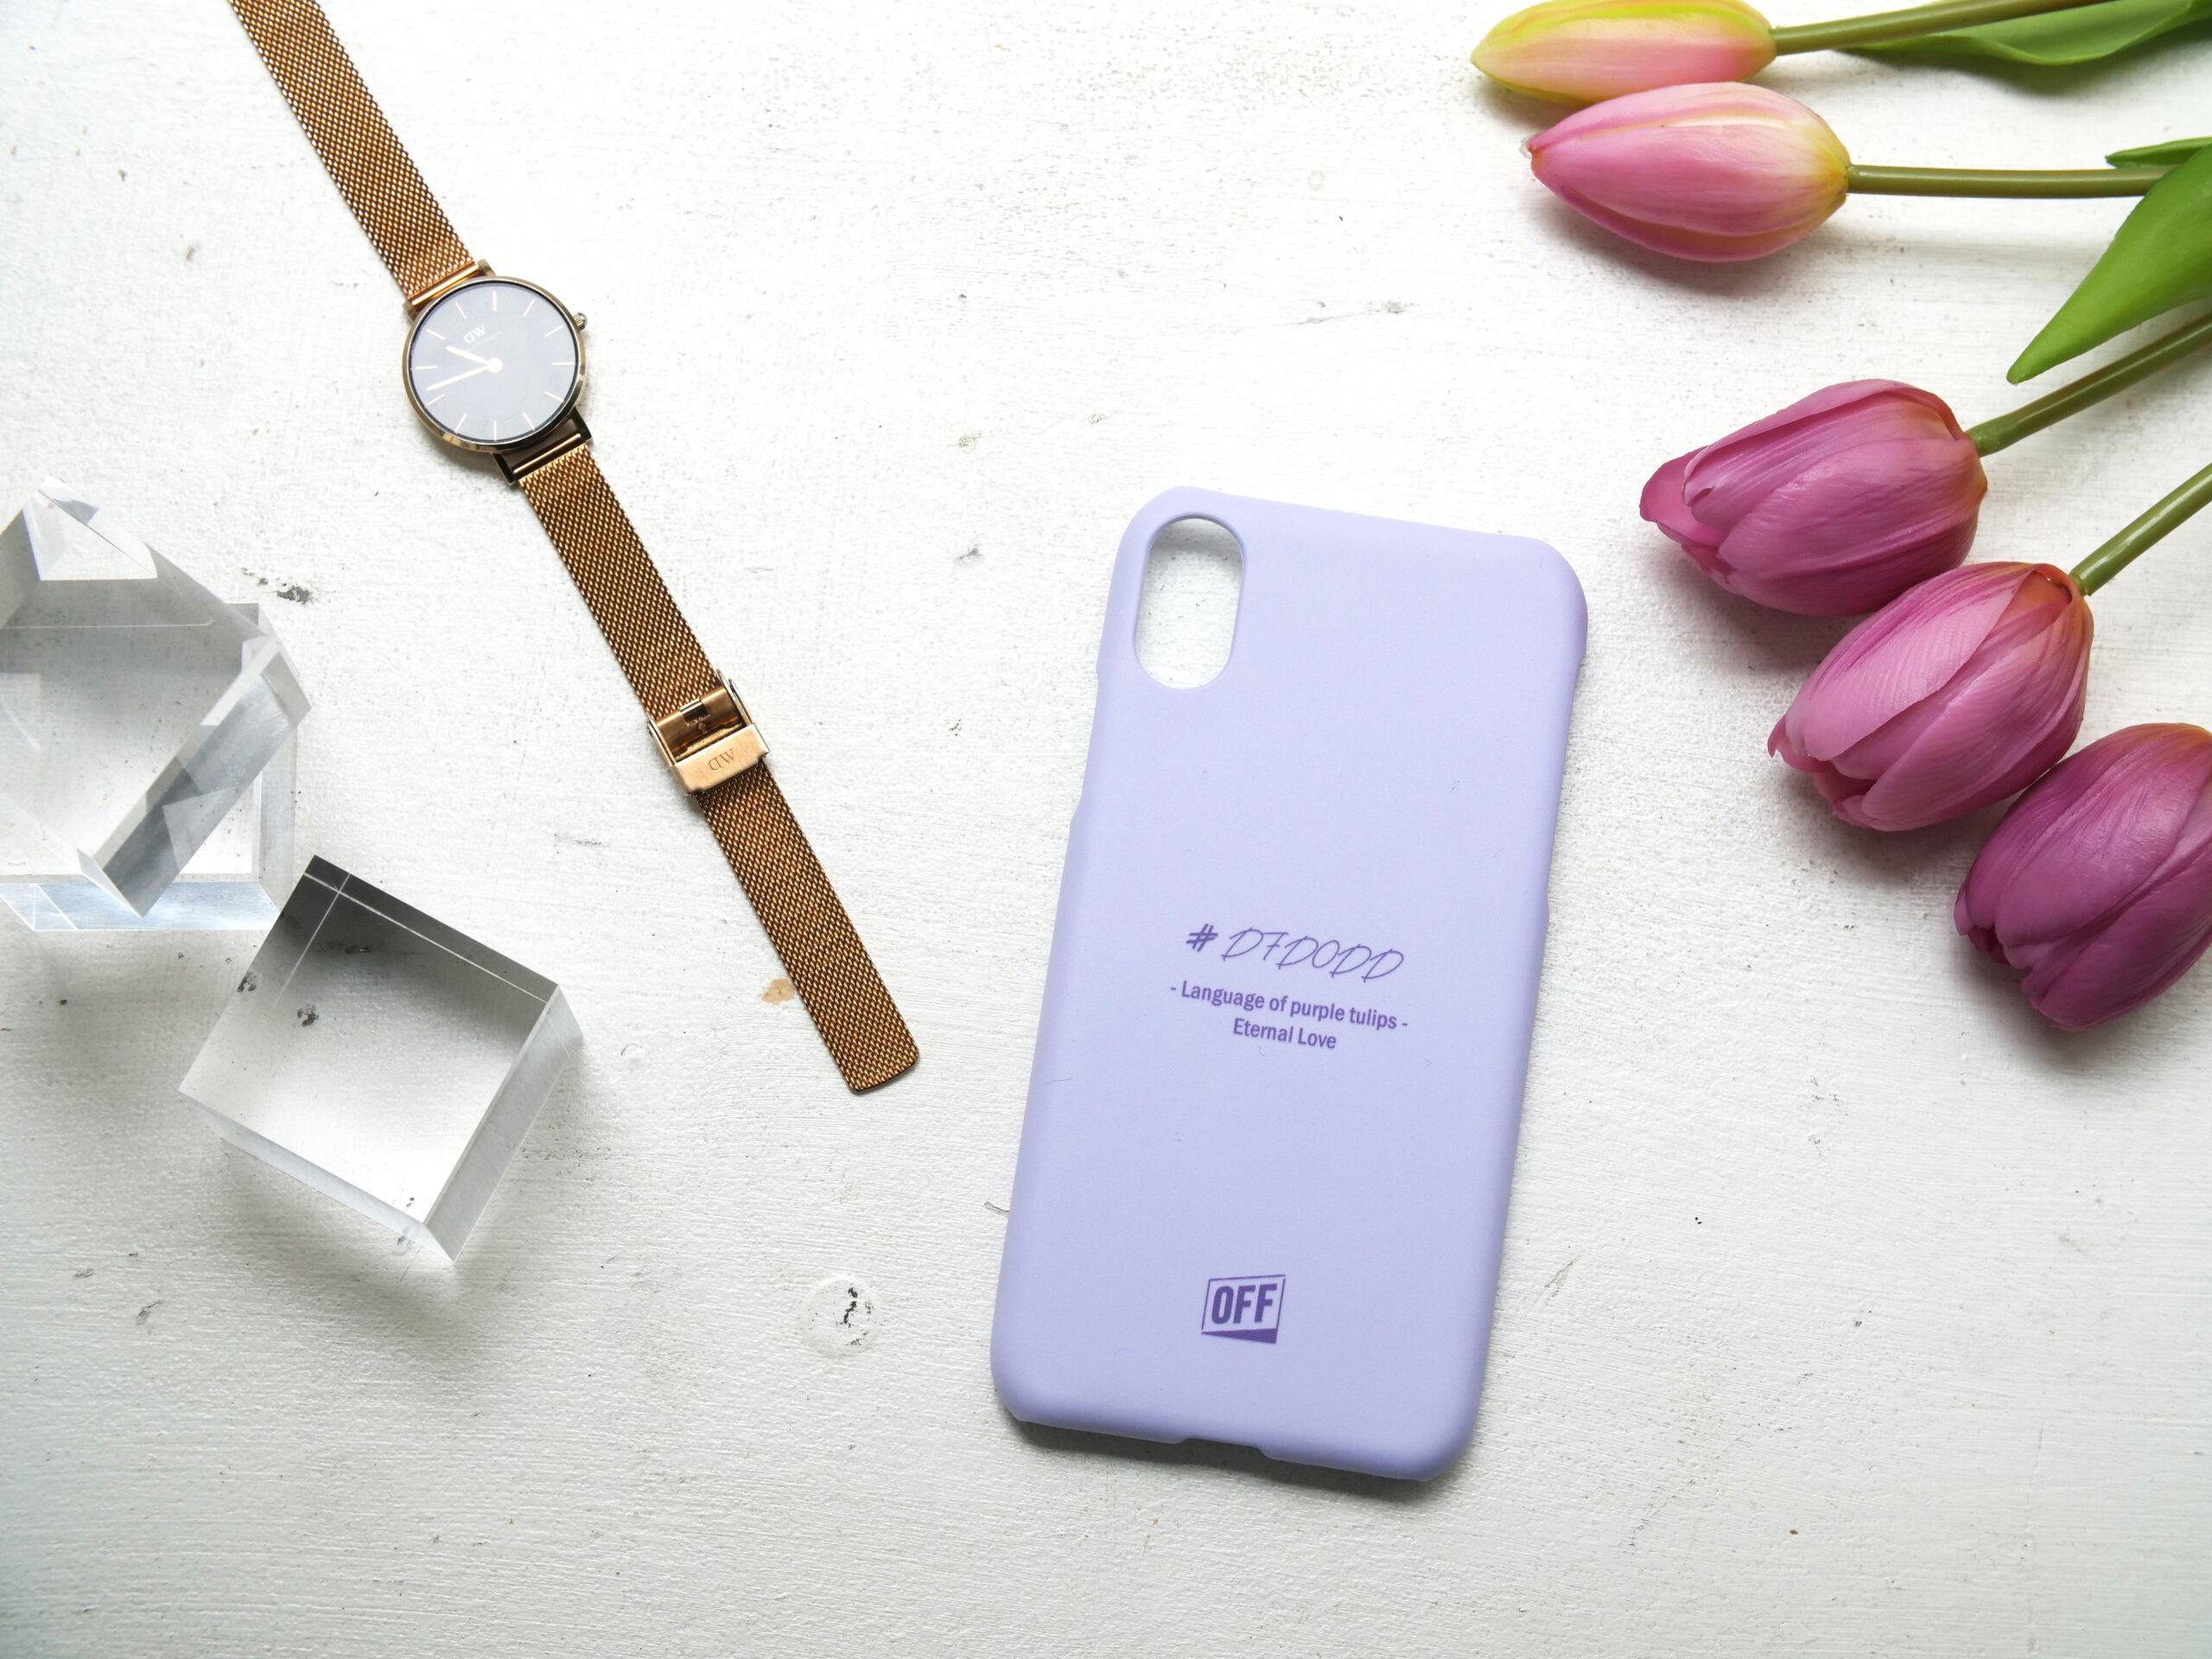 2. Lavender purple【永遠の愛】